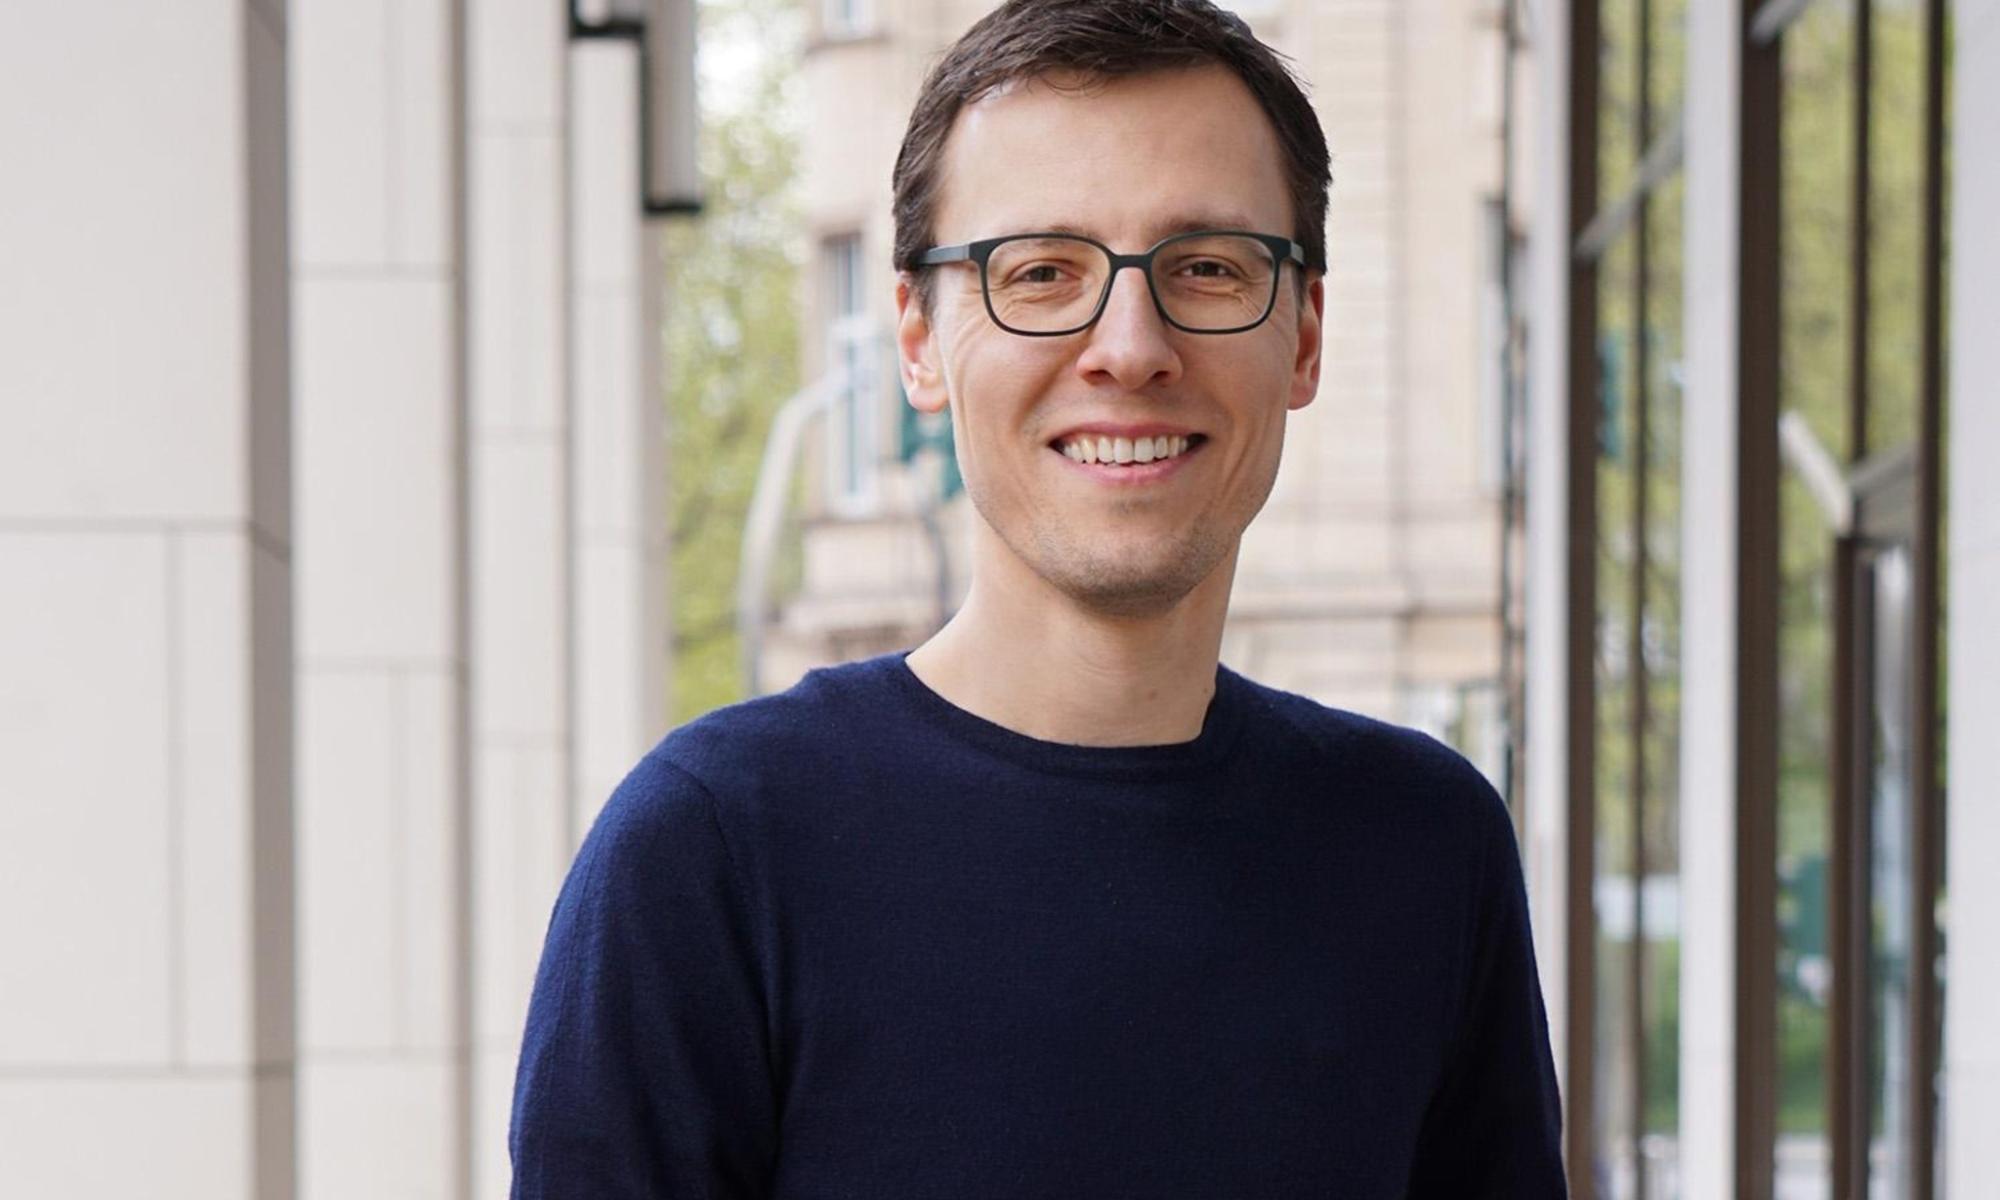 gamearea-Hessen Vorstandsvorsitzender Stefan Marcinek